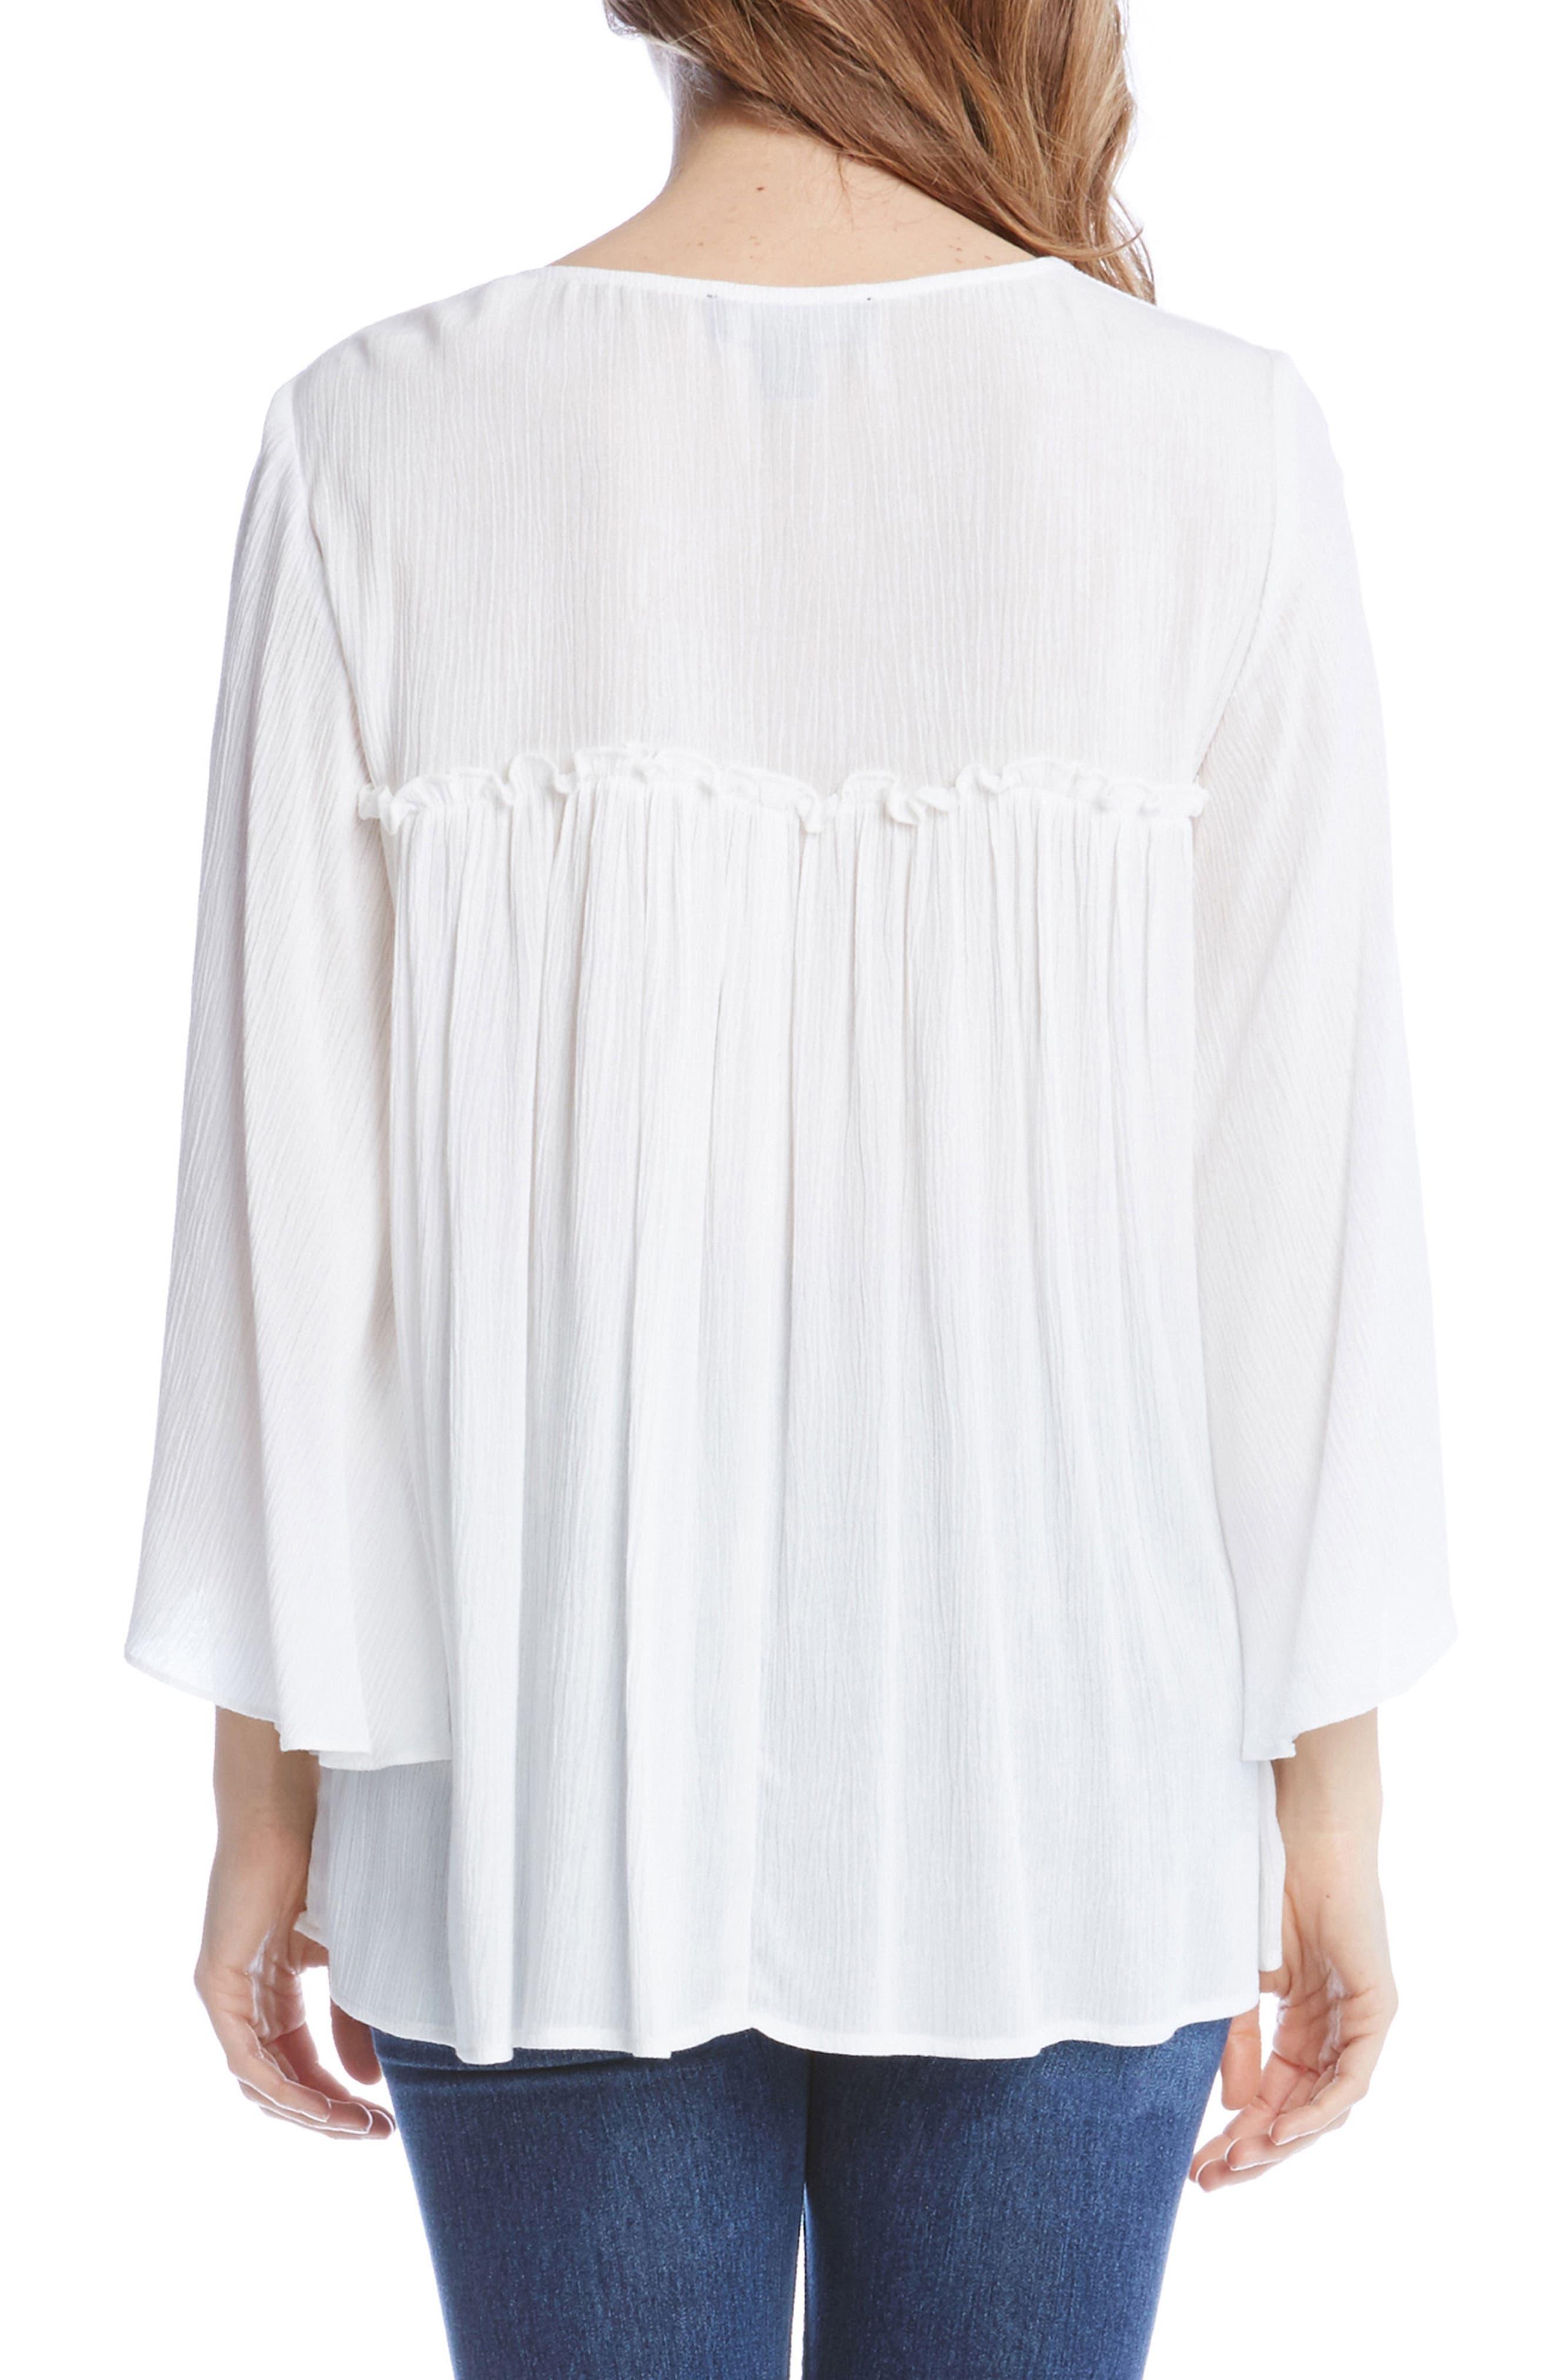 Alternate Image 3  - Karen Kane Bell Sleeve Top